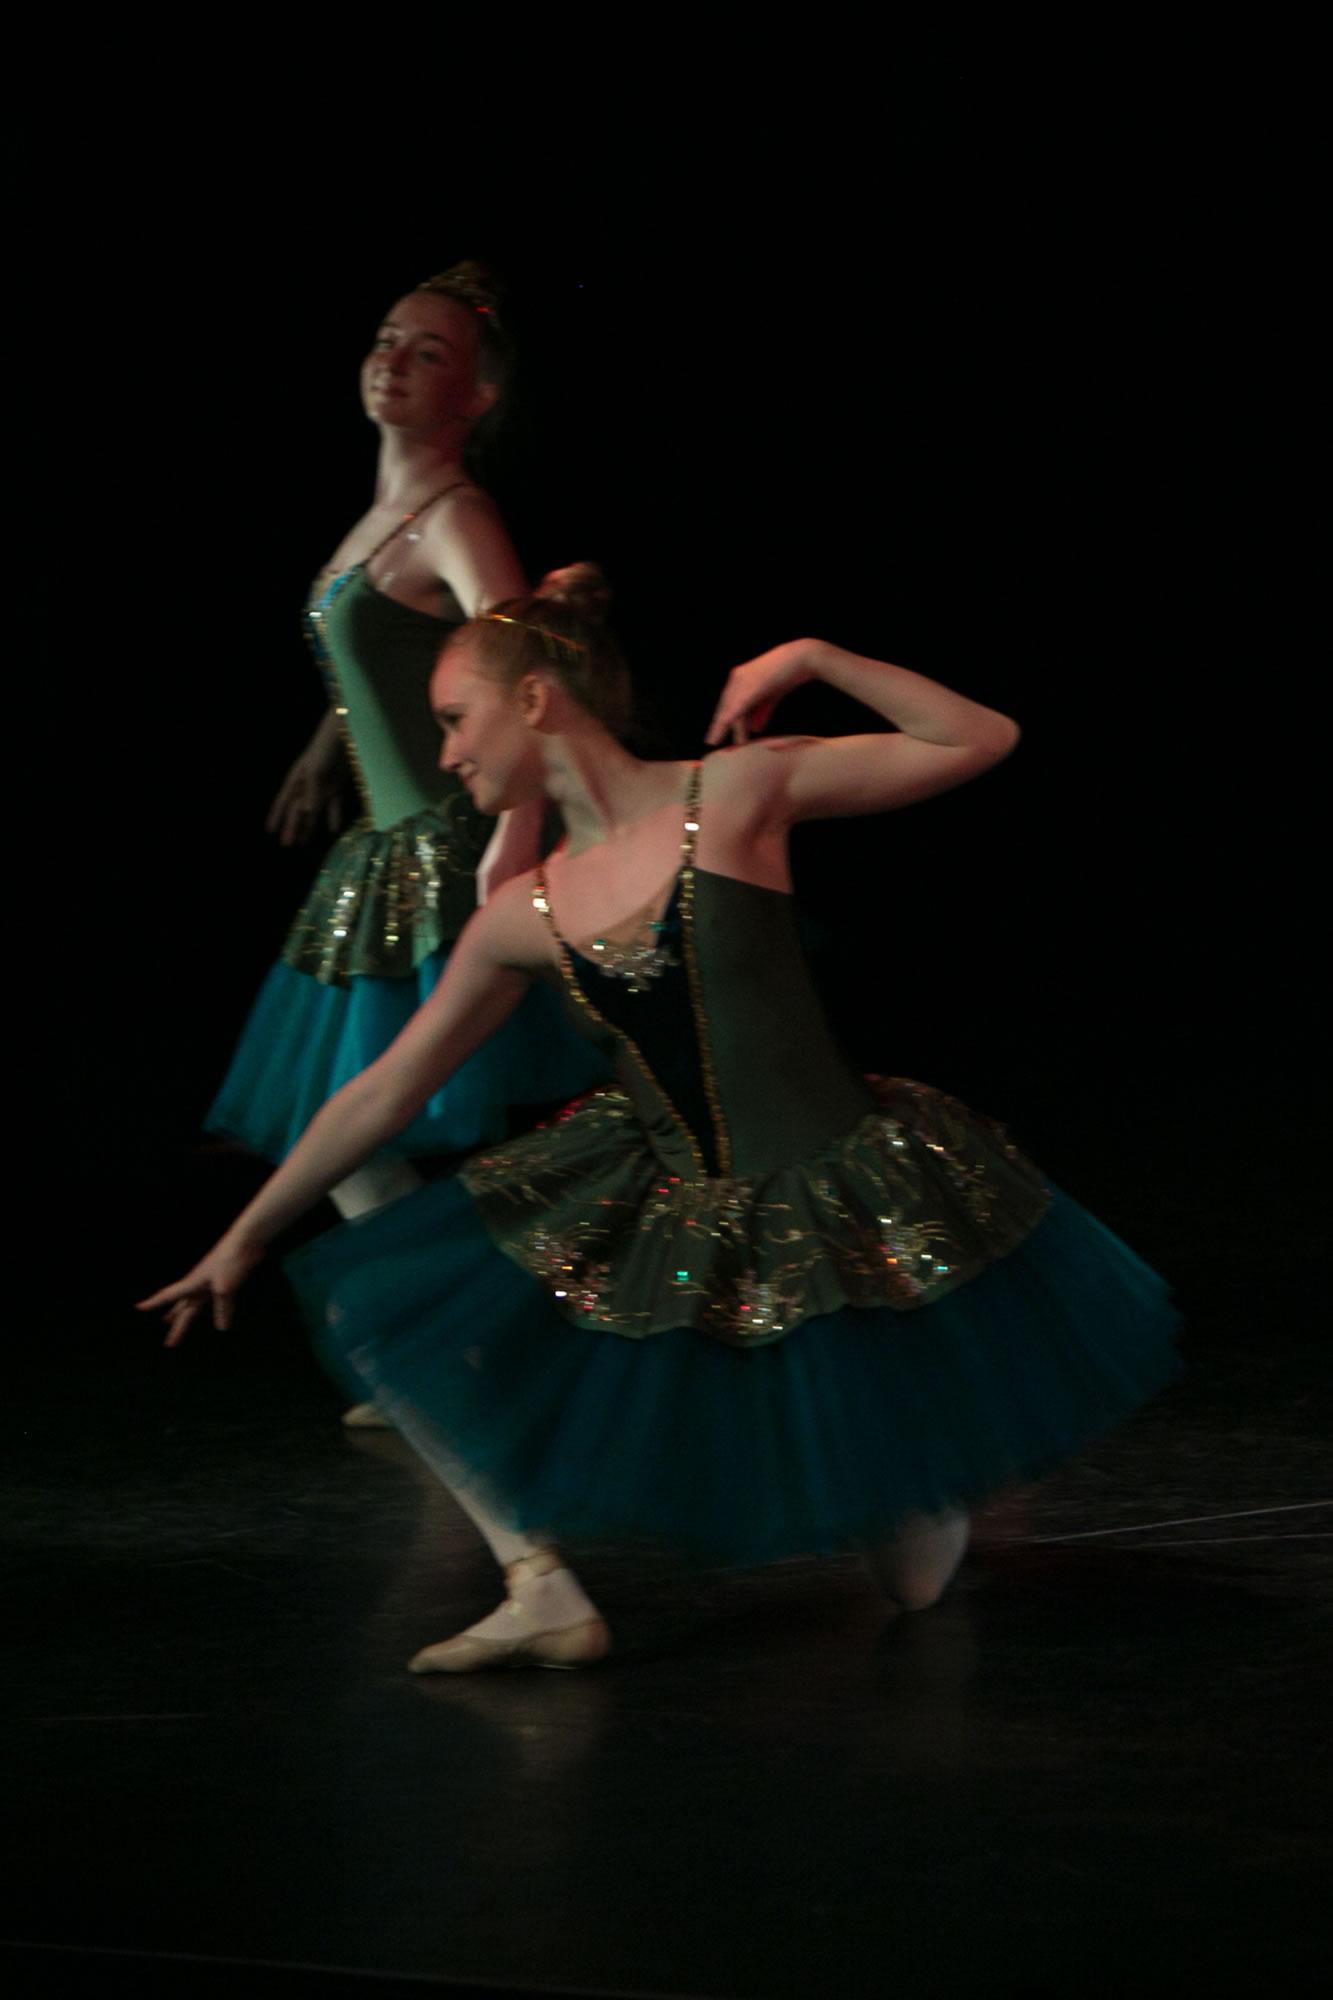 Hitchin_School_of_Dance_Show_2019-SM1_2272.jpg